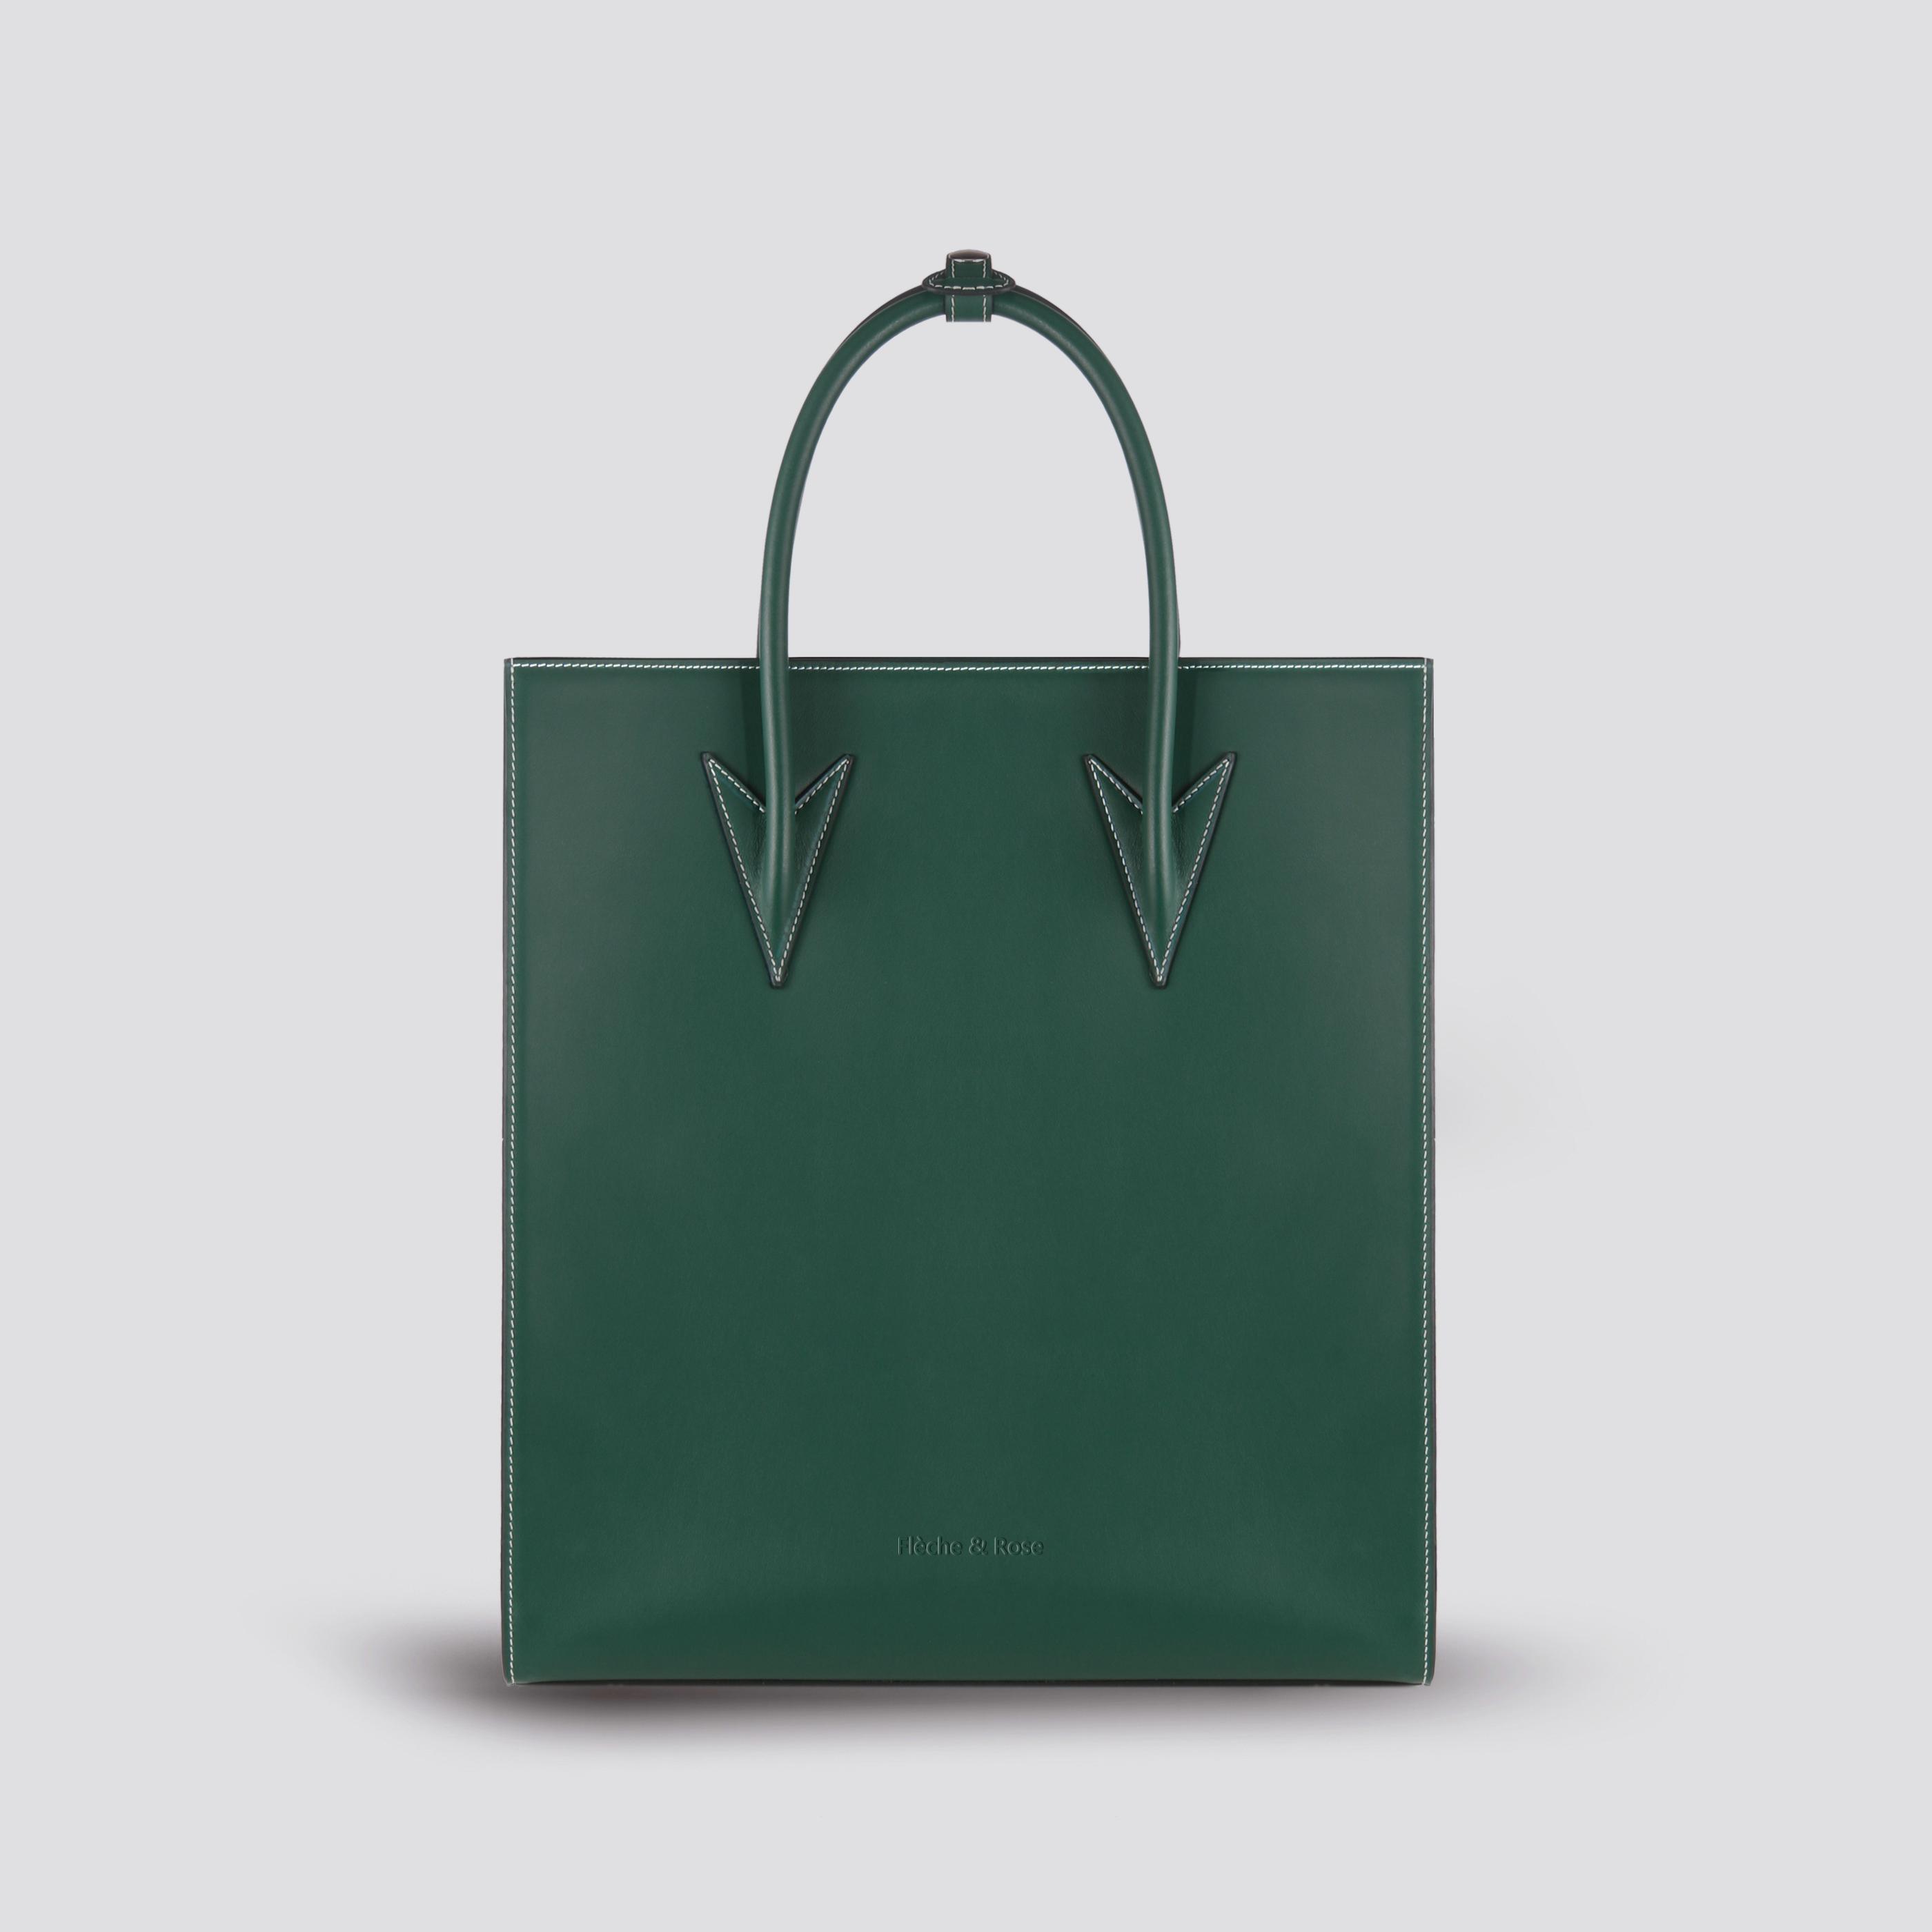 Fleche rose arrow handbag piano score bag vertical casual cowhide fashion large green